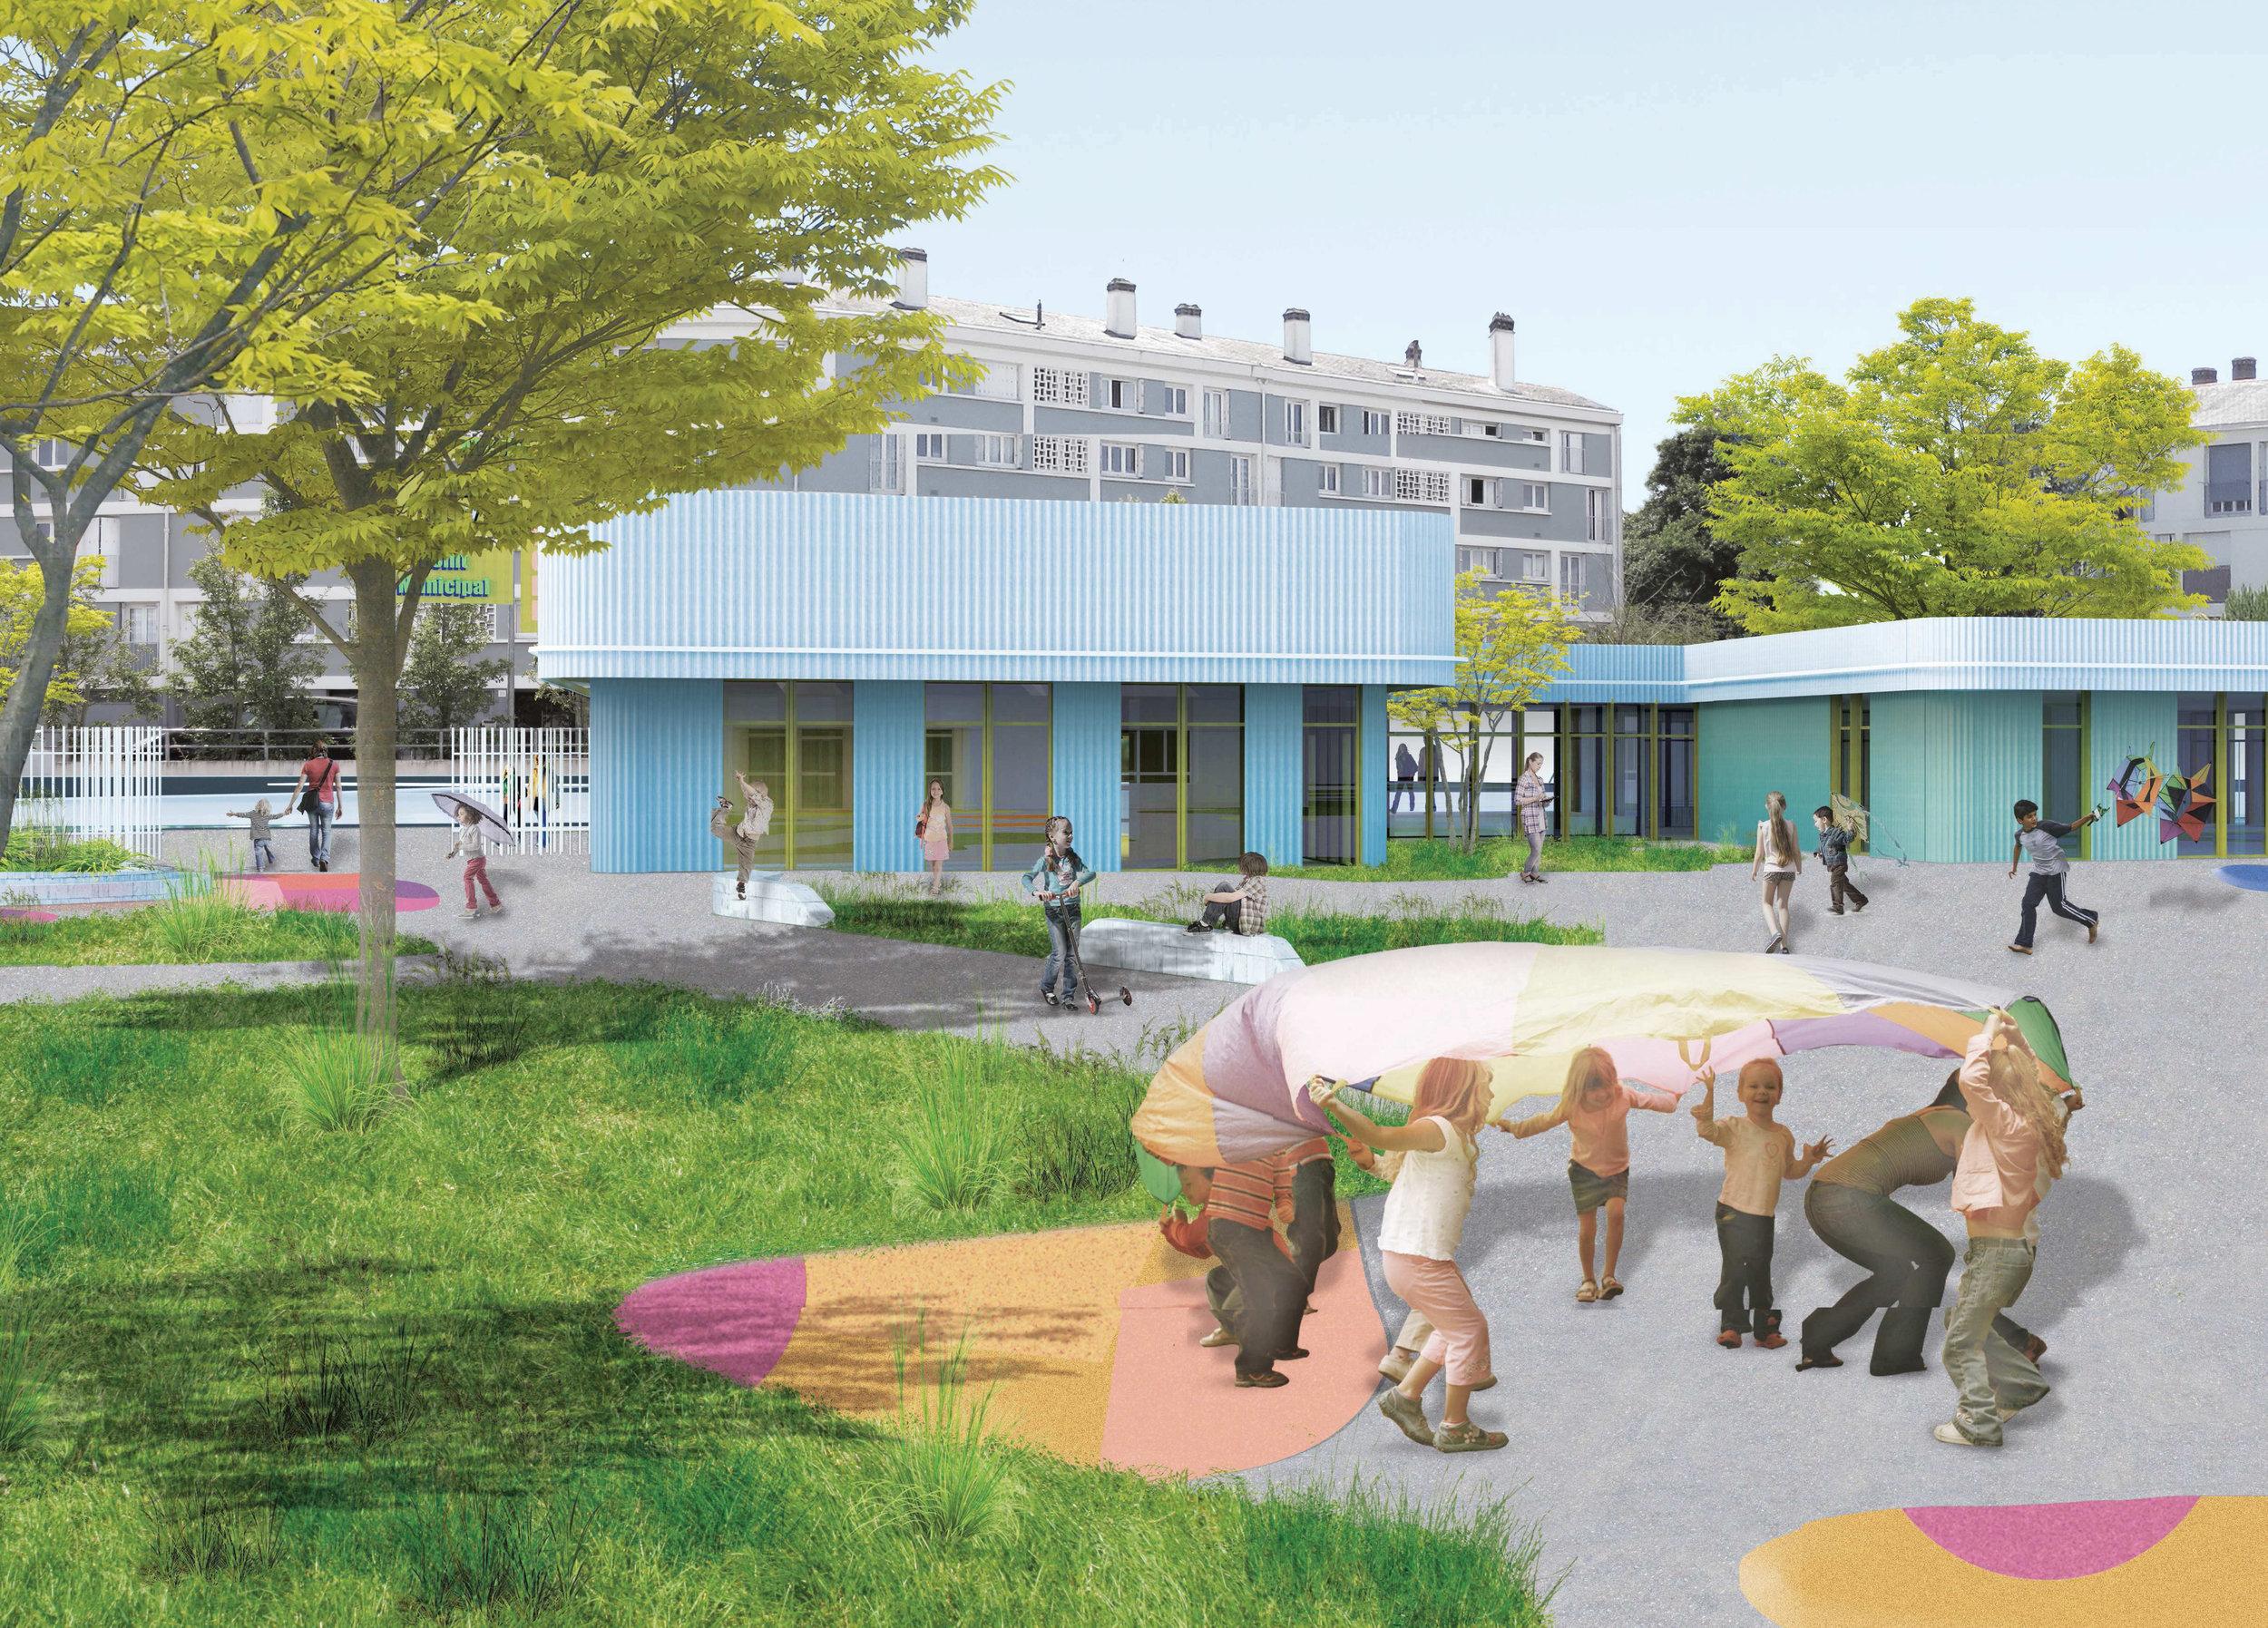 school_saint_nazaire_public_outdoor_design_christophe_gautrand_landscape_4.jpg